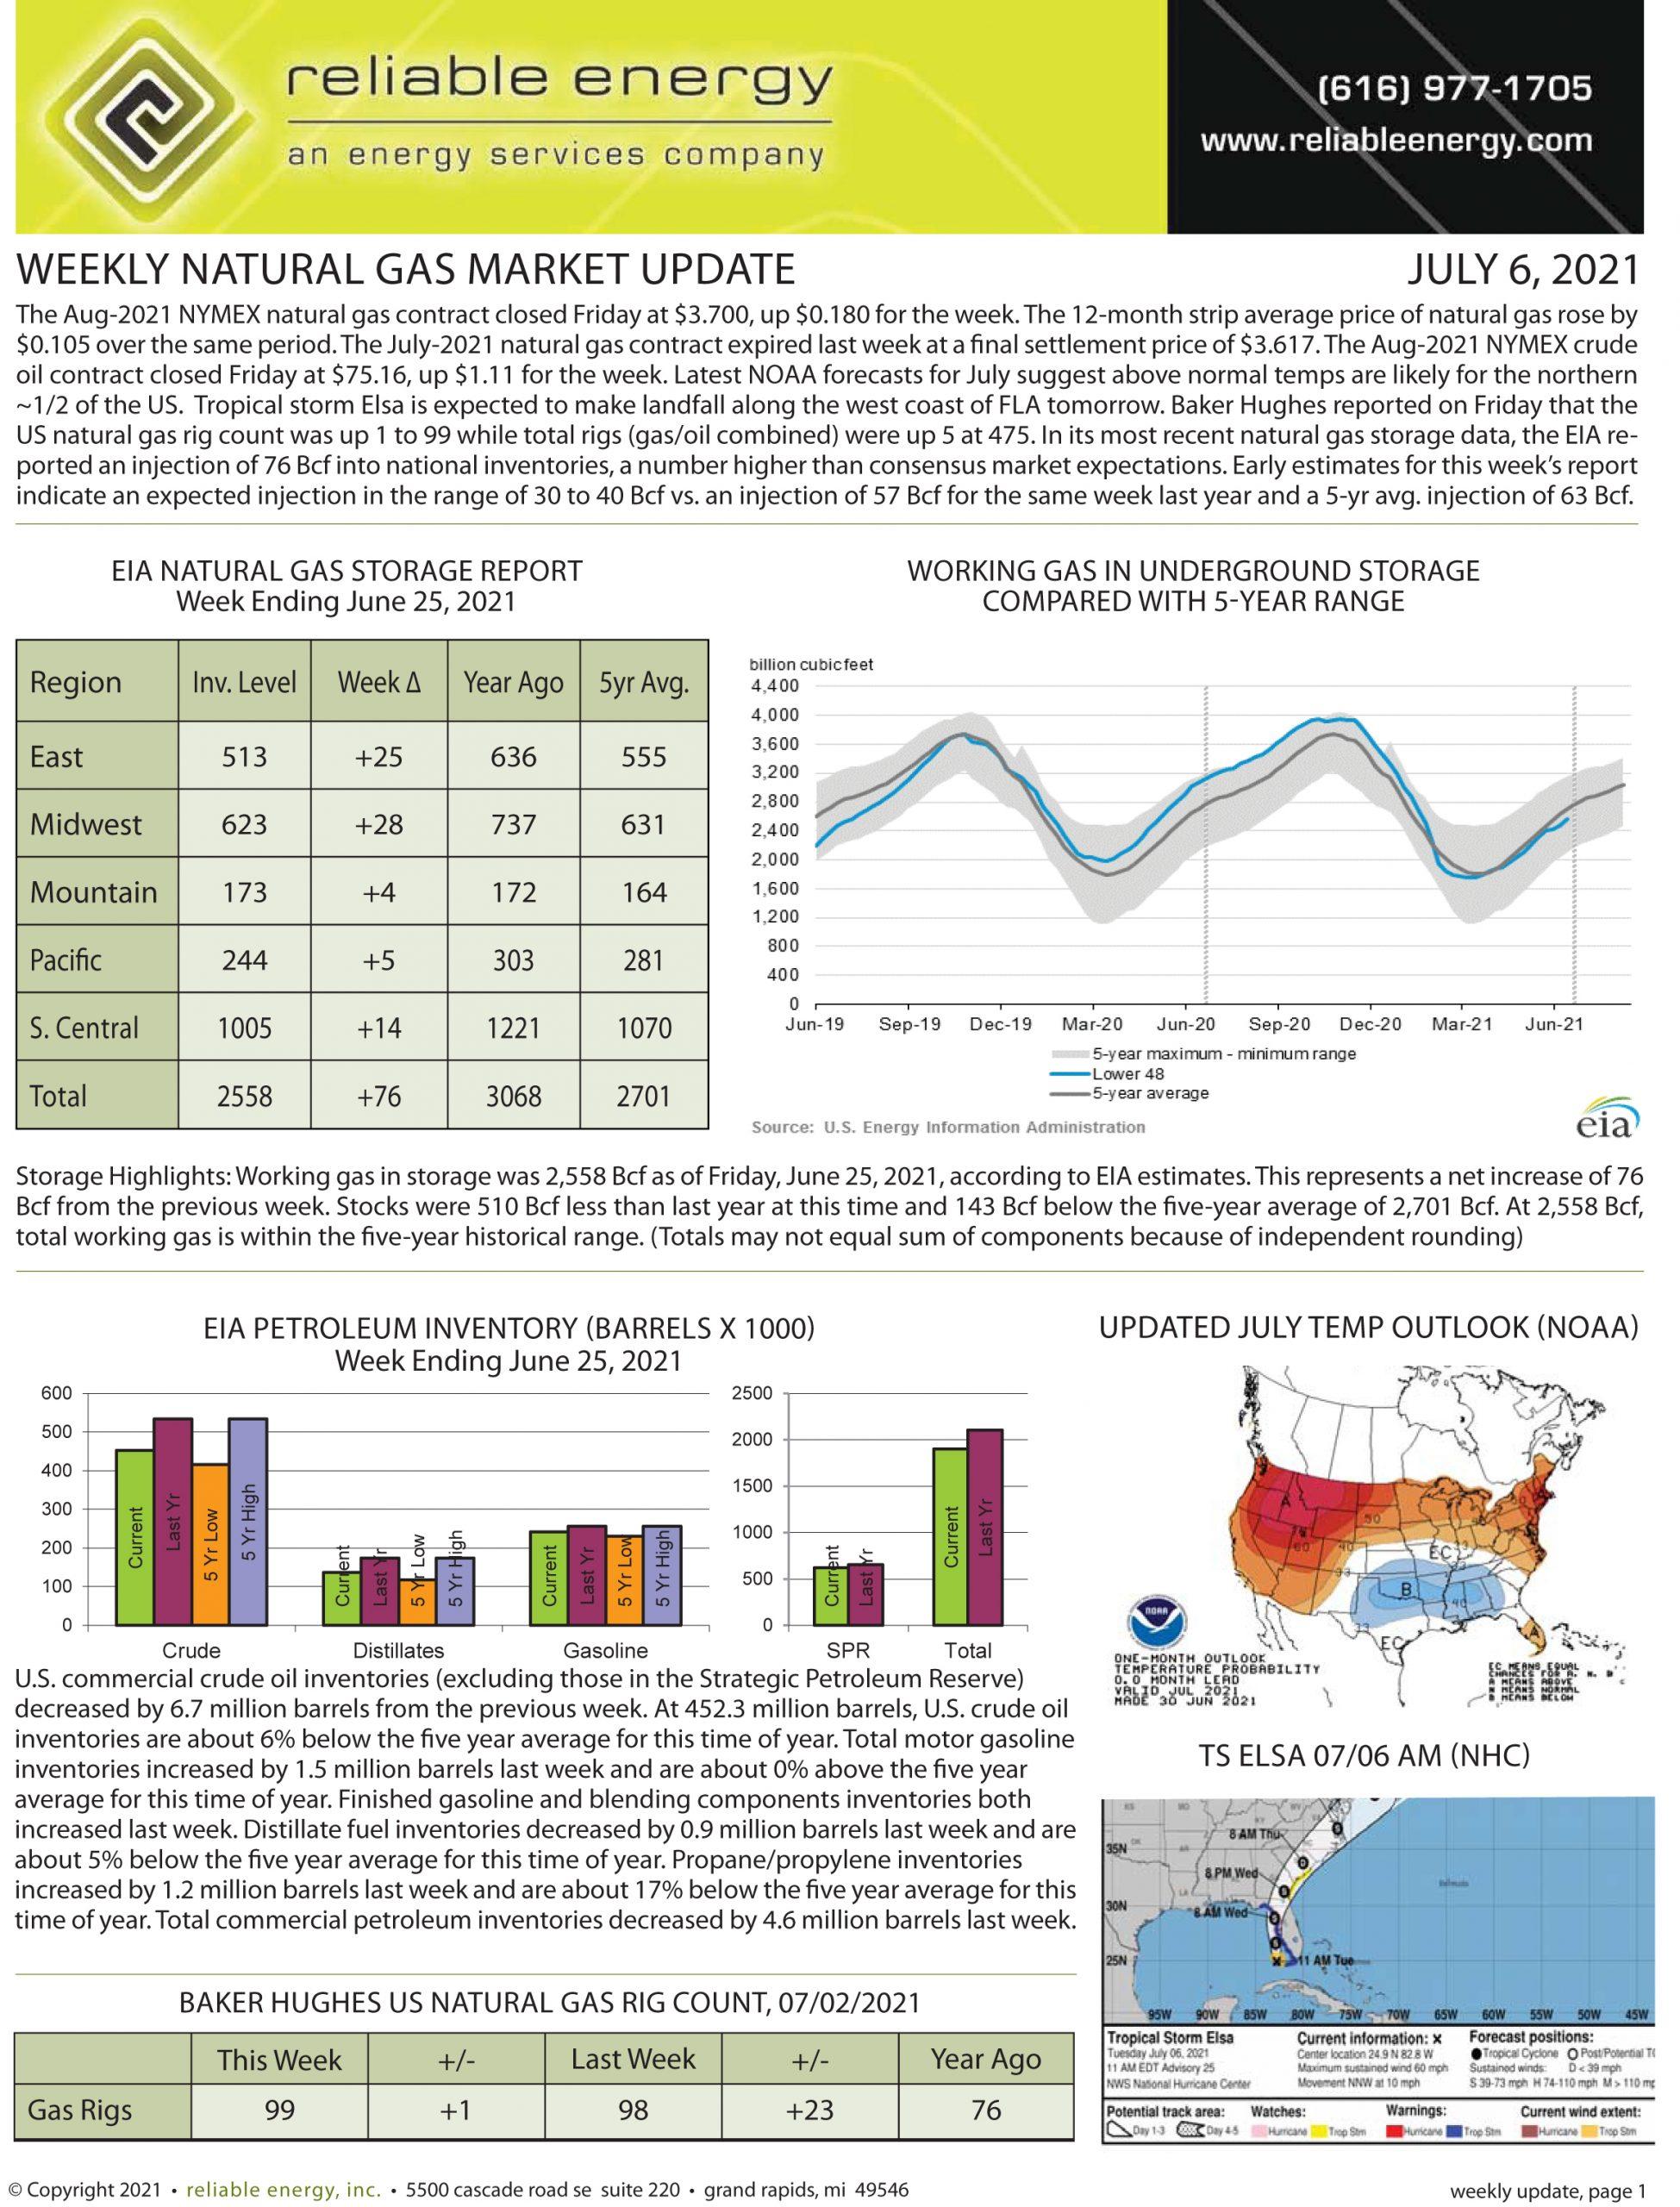 Natural Gas Market Update – July 6, 2021